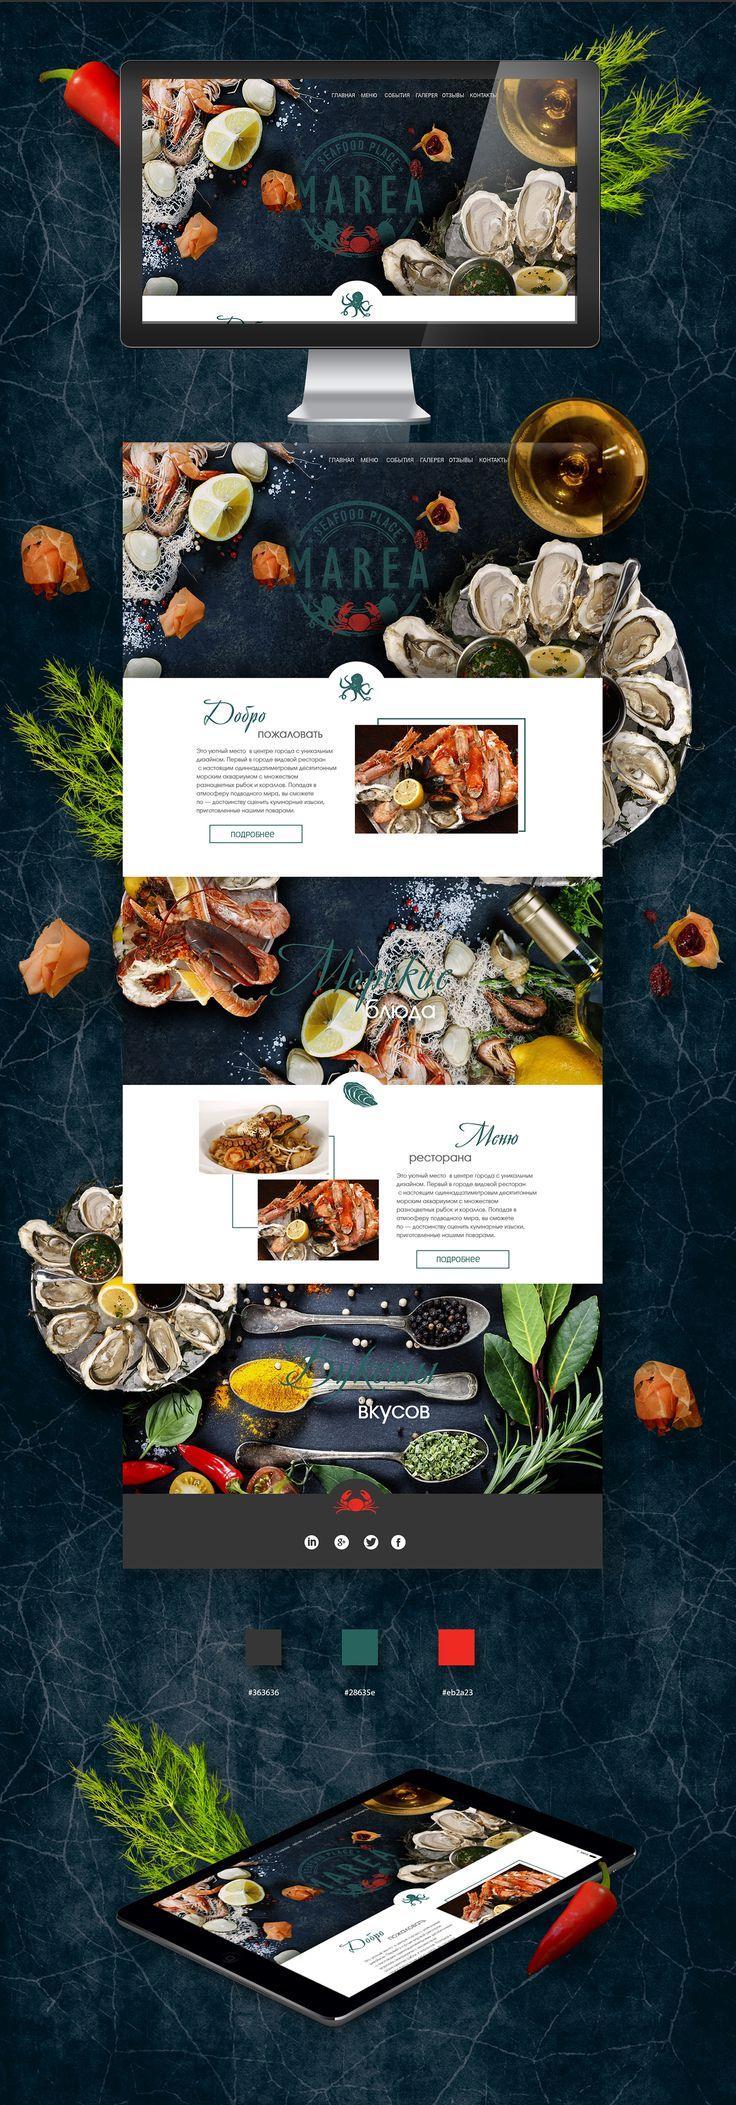 Website design restaurant(Дизайн сайта ресторана) on Behance